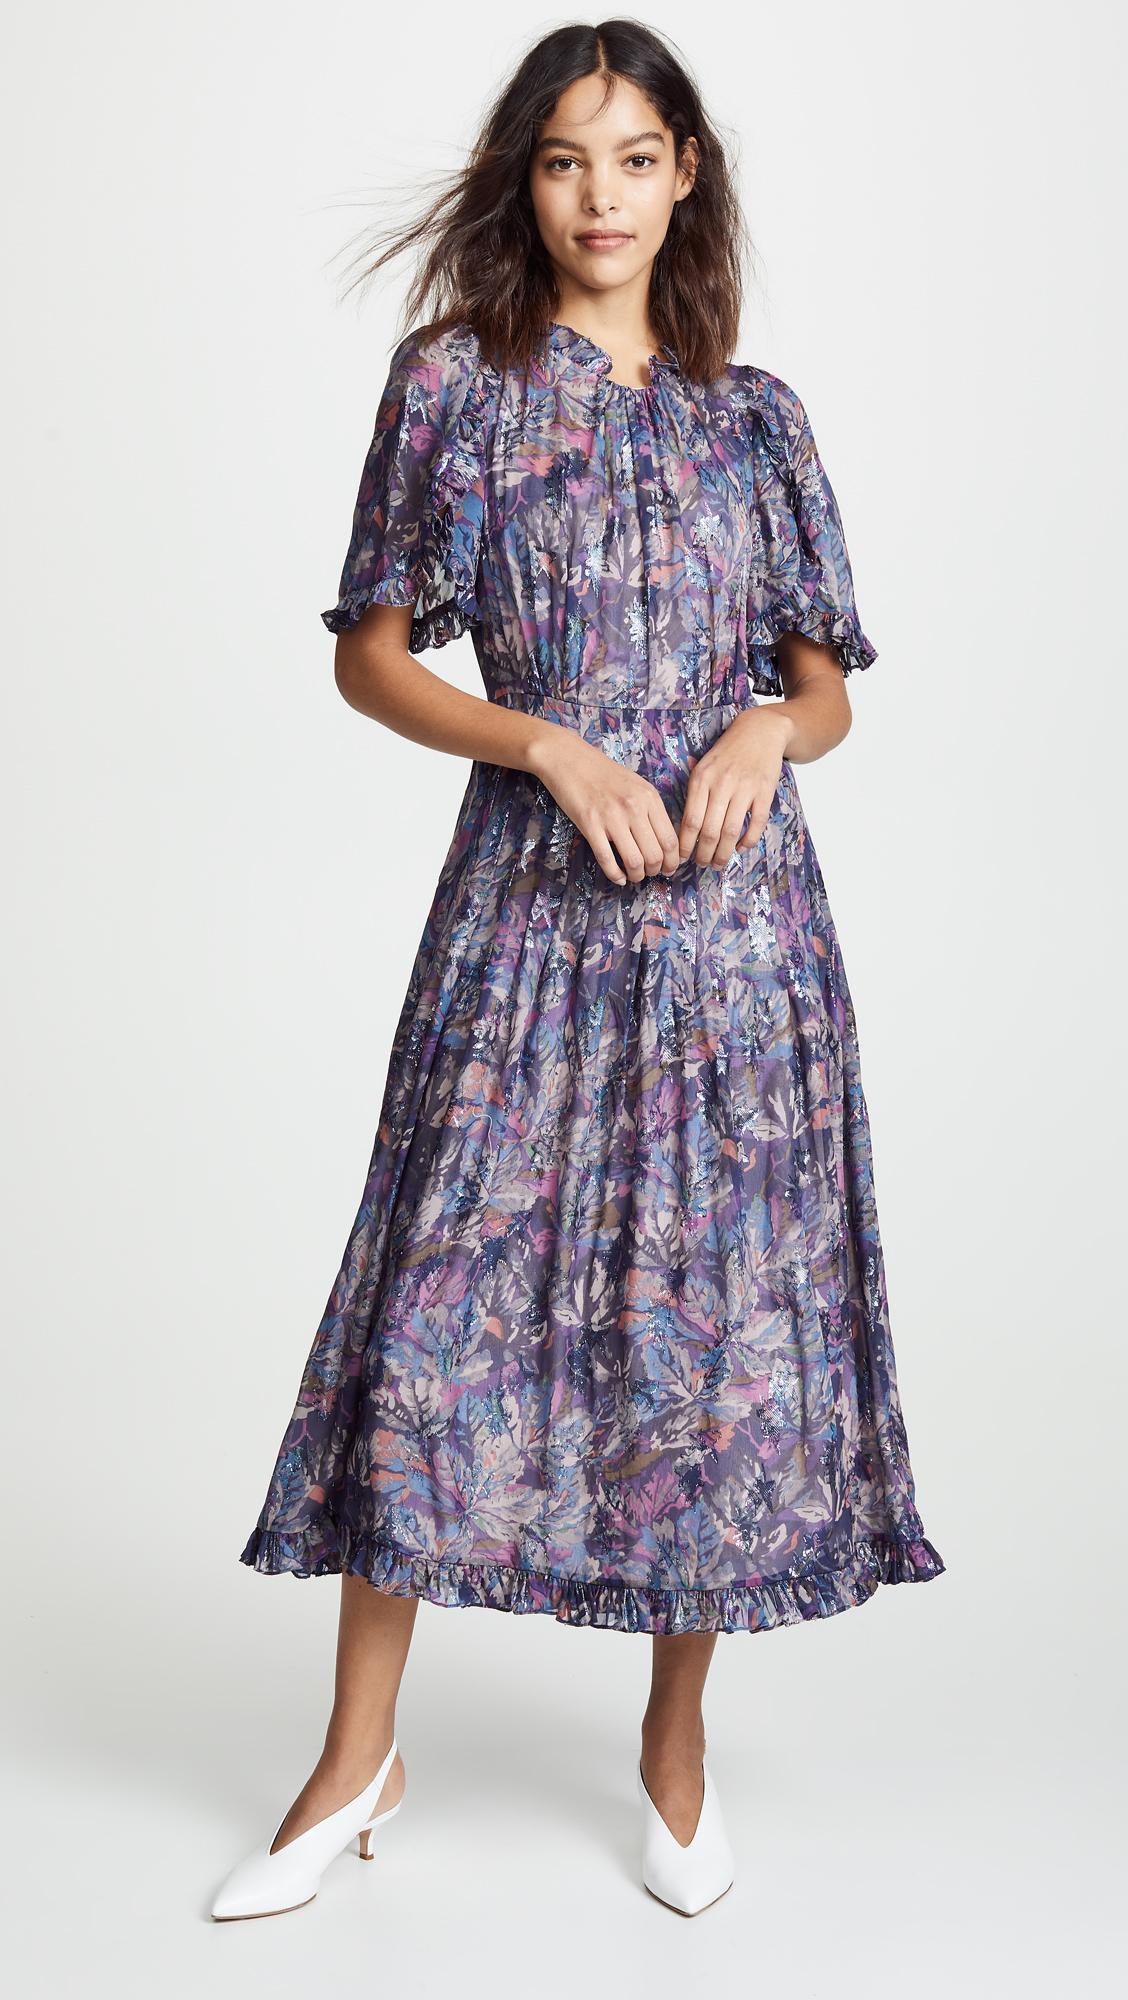 Rebecca Taylor Short Sleeve Floral Dress